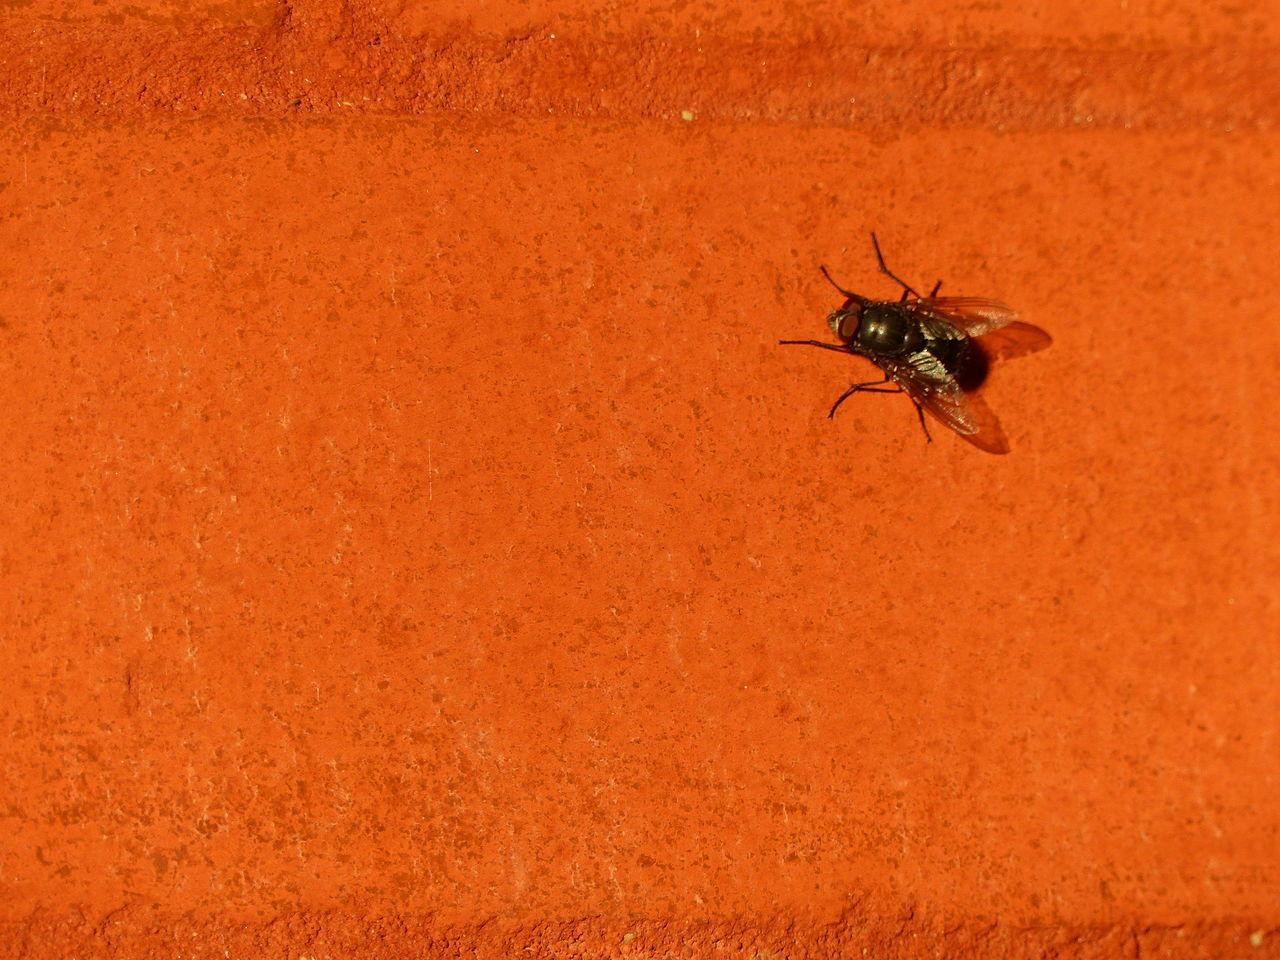 Brick Fly Fly On Brick Full Frame Orange Orange Wall  Textured  Wall Zoology